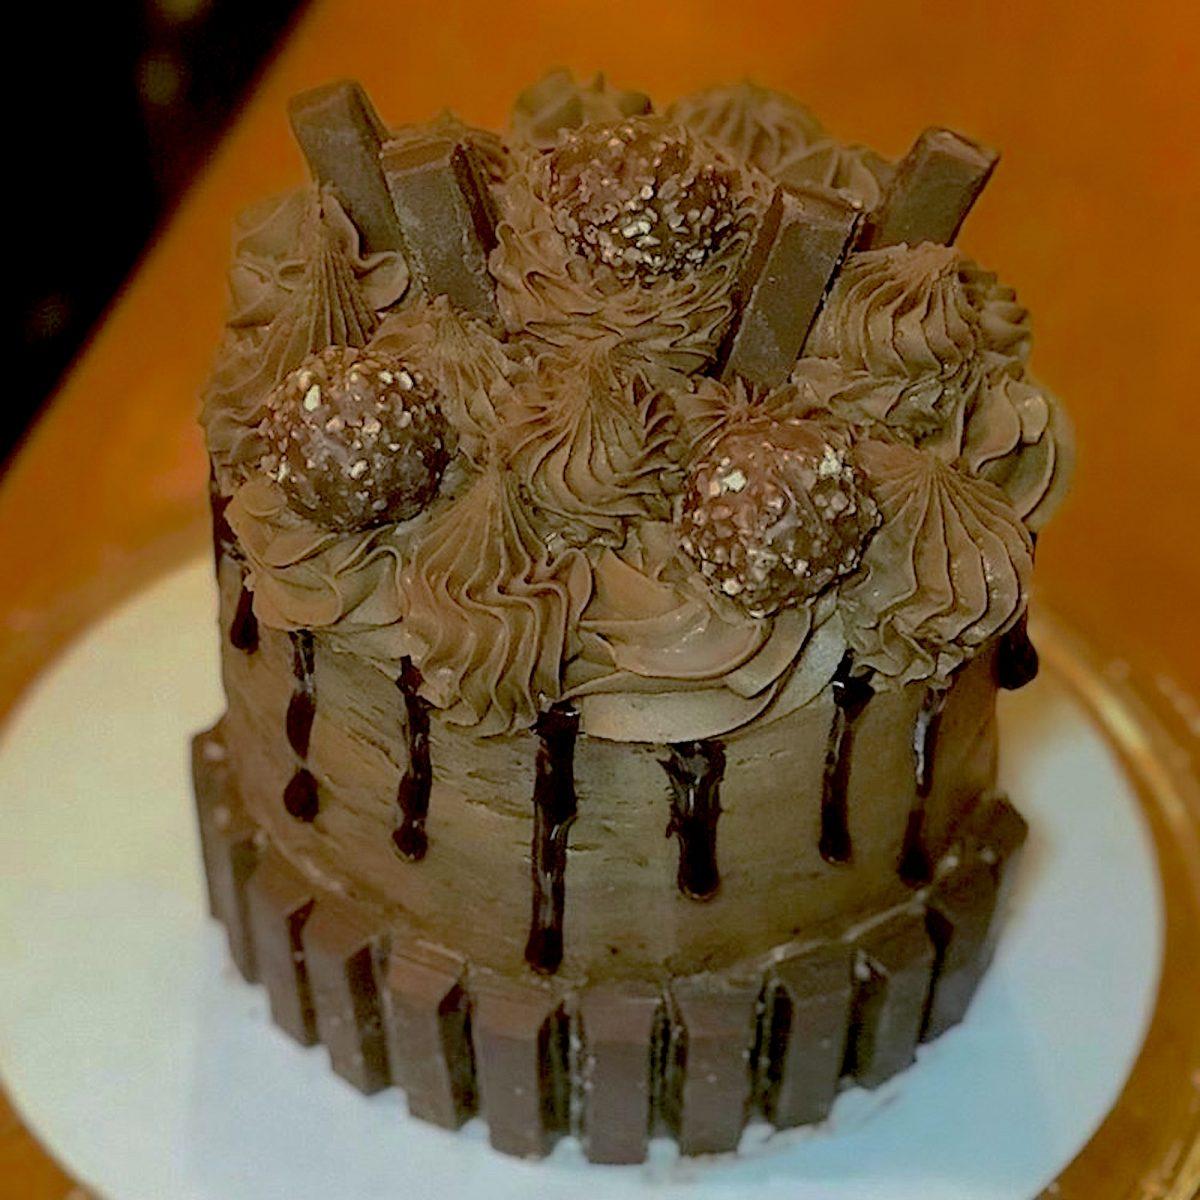 Chocolate cake by Jordan Legend